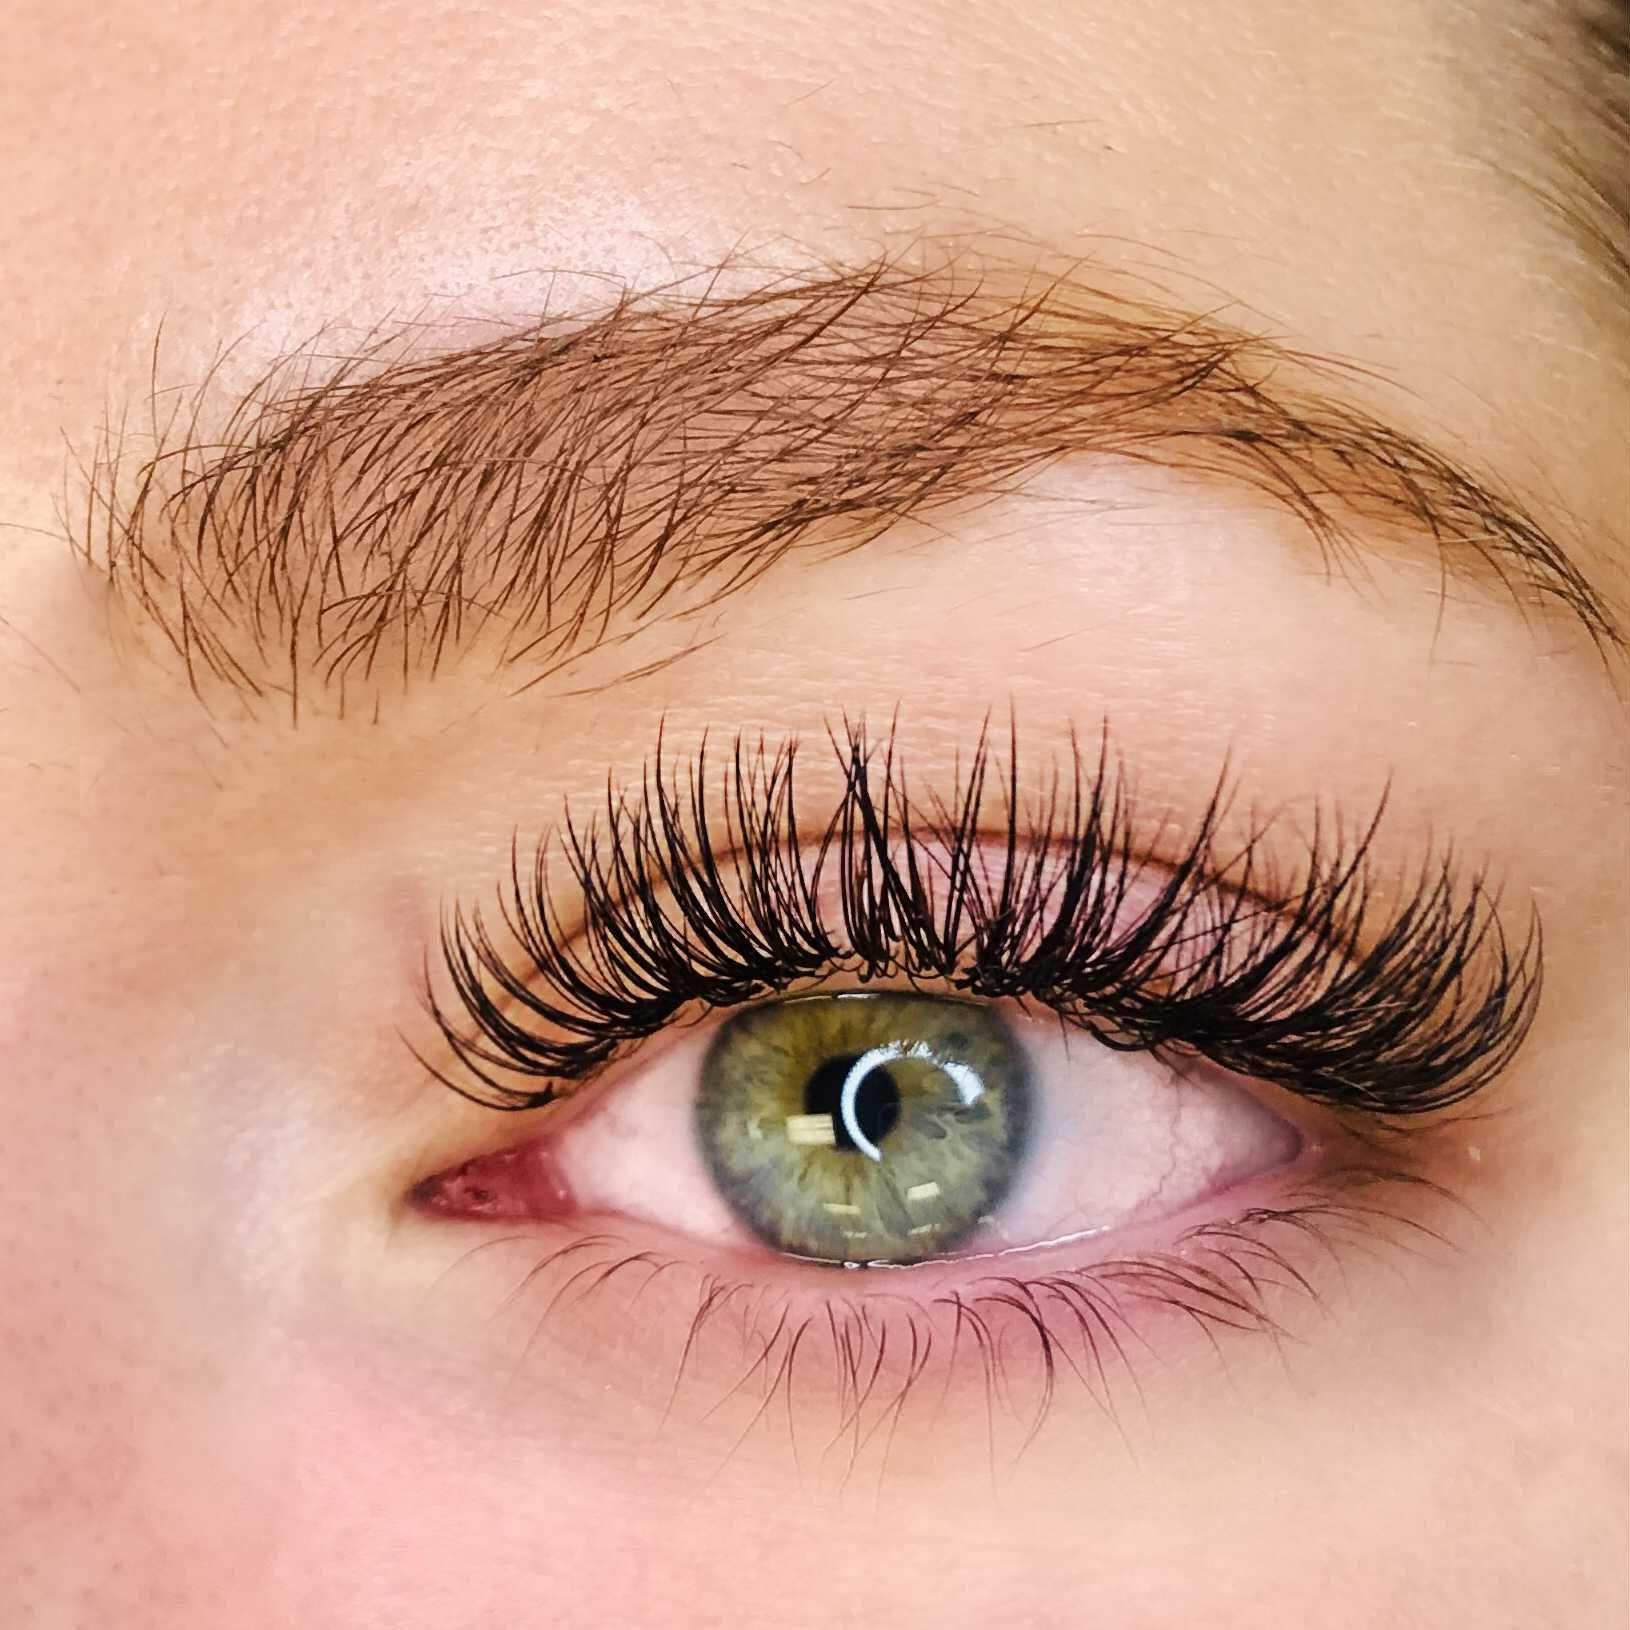 5 Benefits of Eyelash Extensions Eyelash extensions